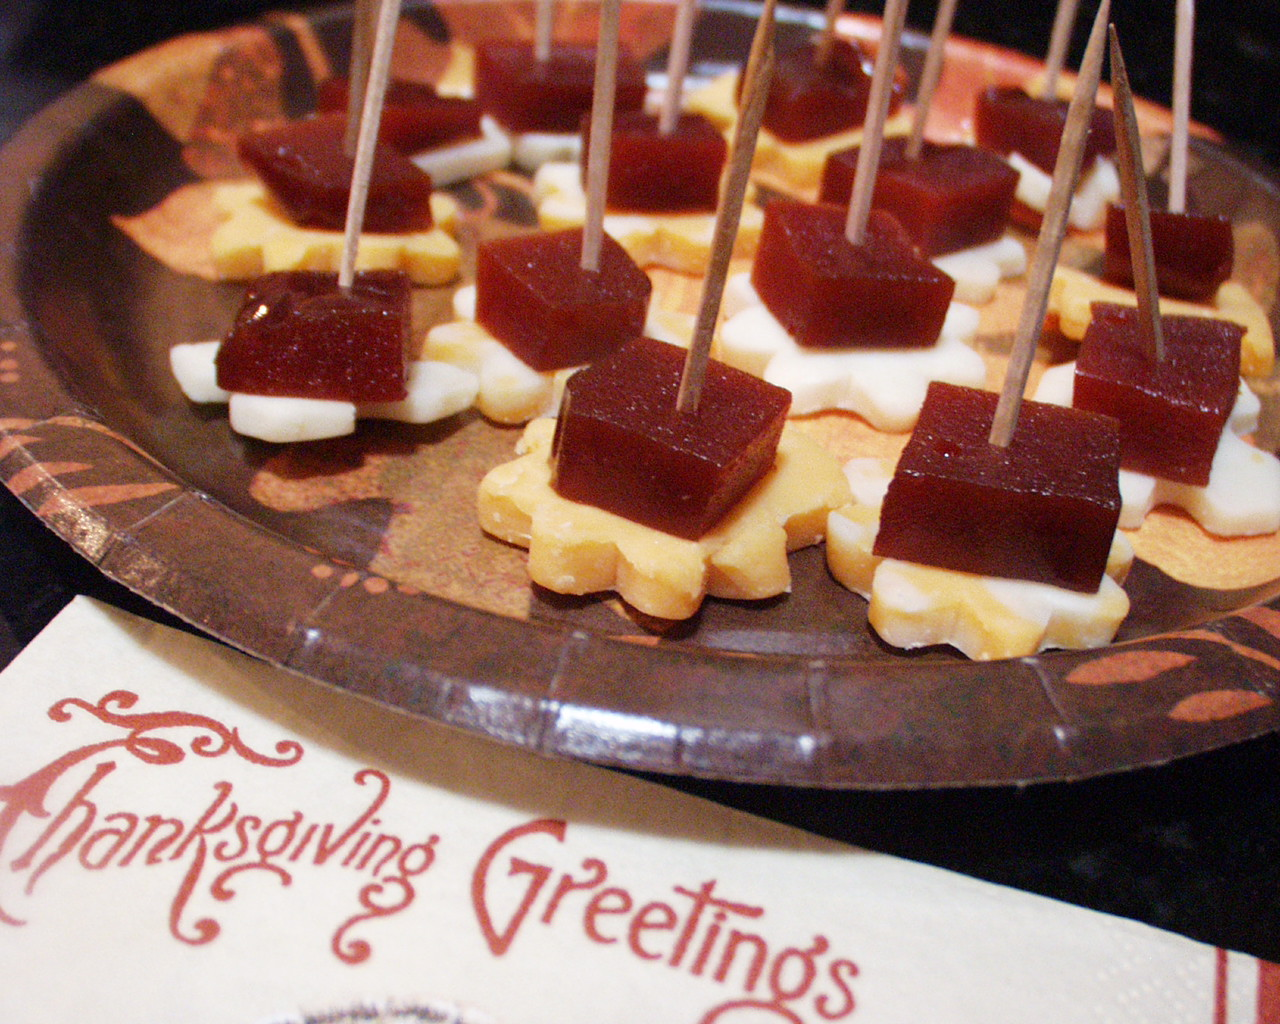 Puerto rican holiday event recipes genius kitchen forumfinder Gallery